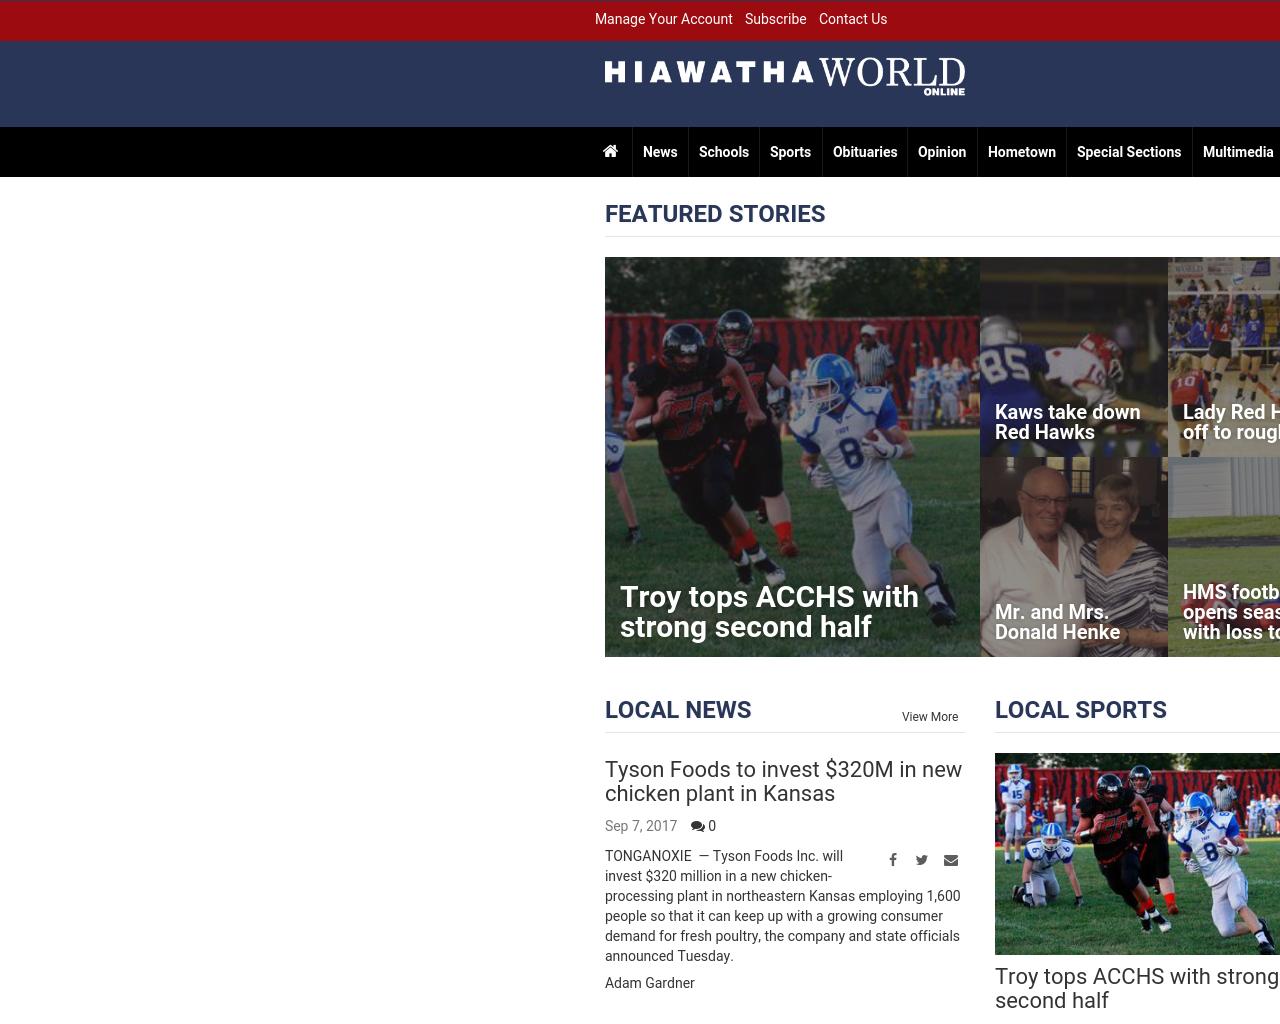 Hiawatha-World-Online-Advertising-Reviews-Pricing